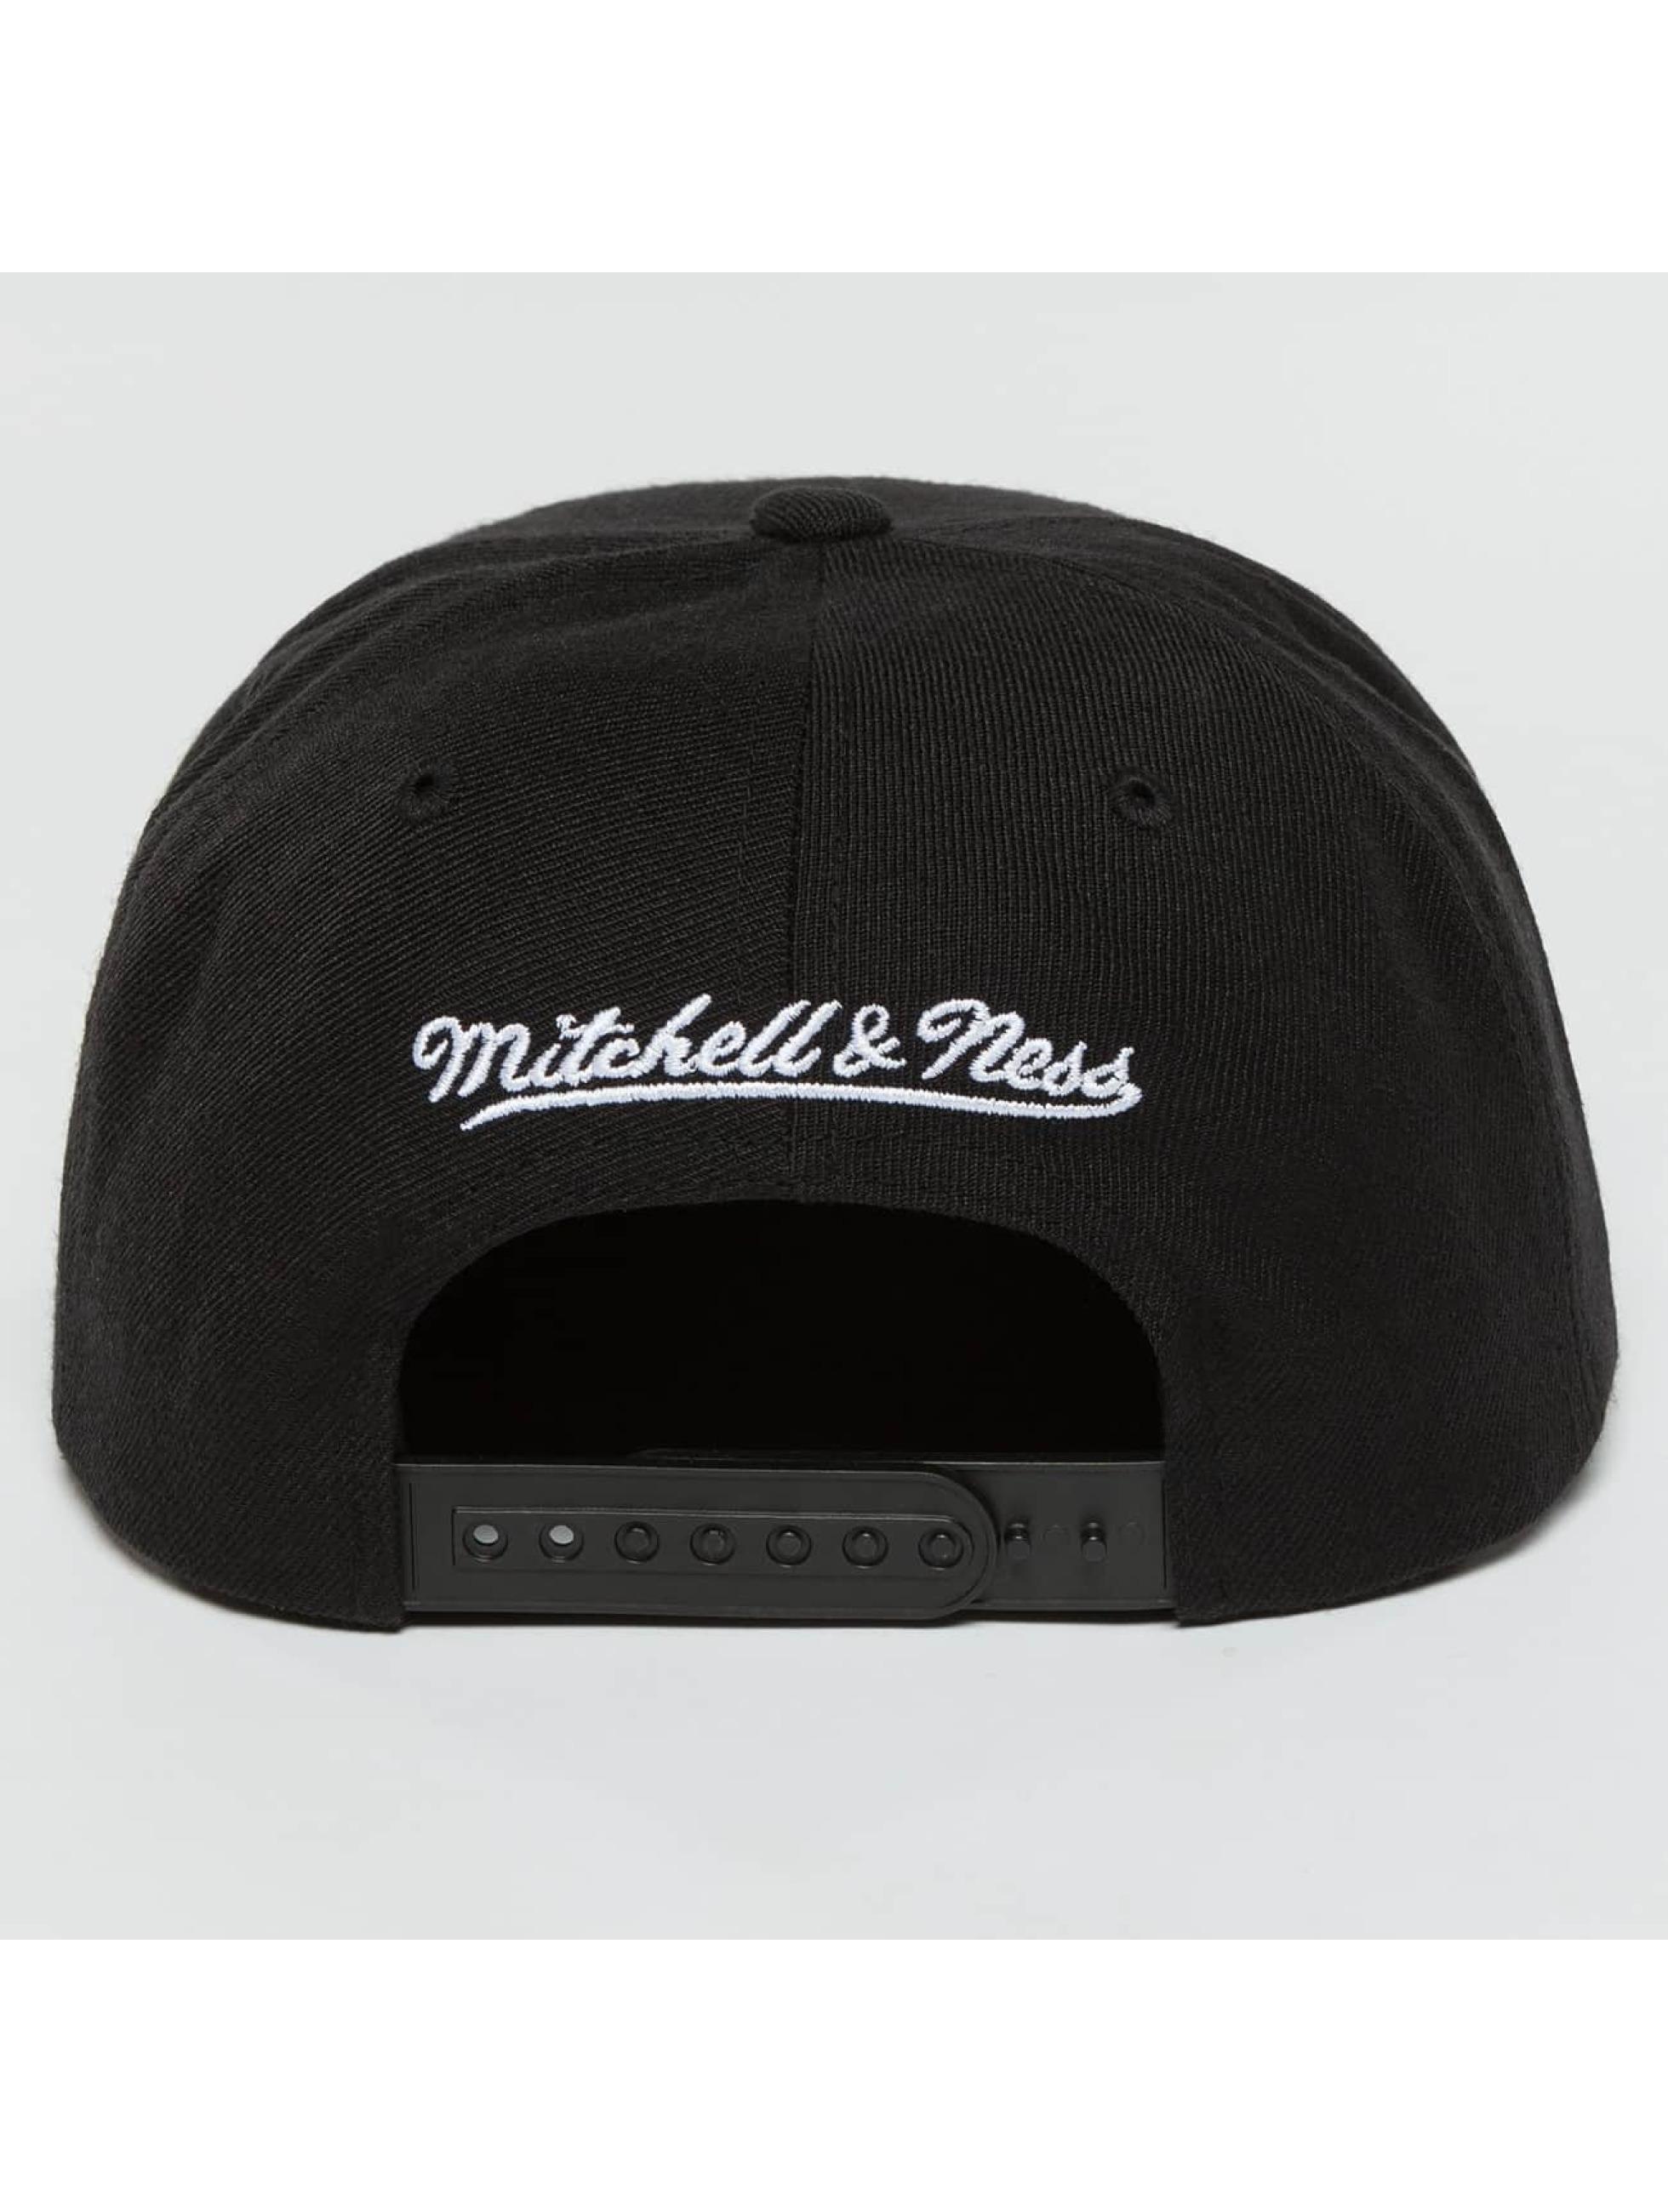 Mitchell & Ness Casquette Snapback & Strapback Full Dollar Chicago Bulls noir